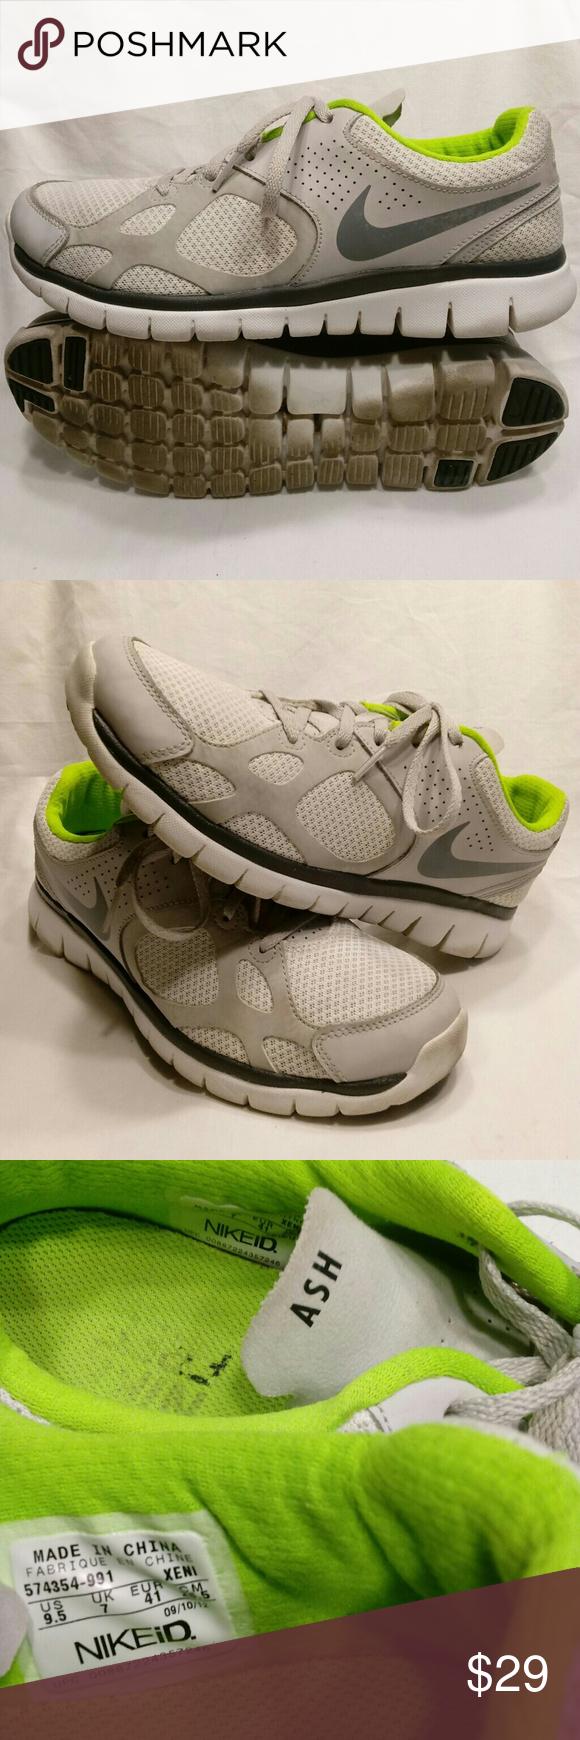 2389efd19d8da Nike ID Free Flex  Size 9.5  Run  Walk  Neon Green Clean and